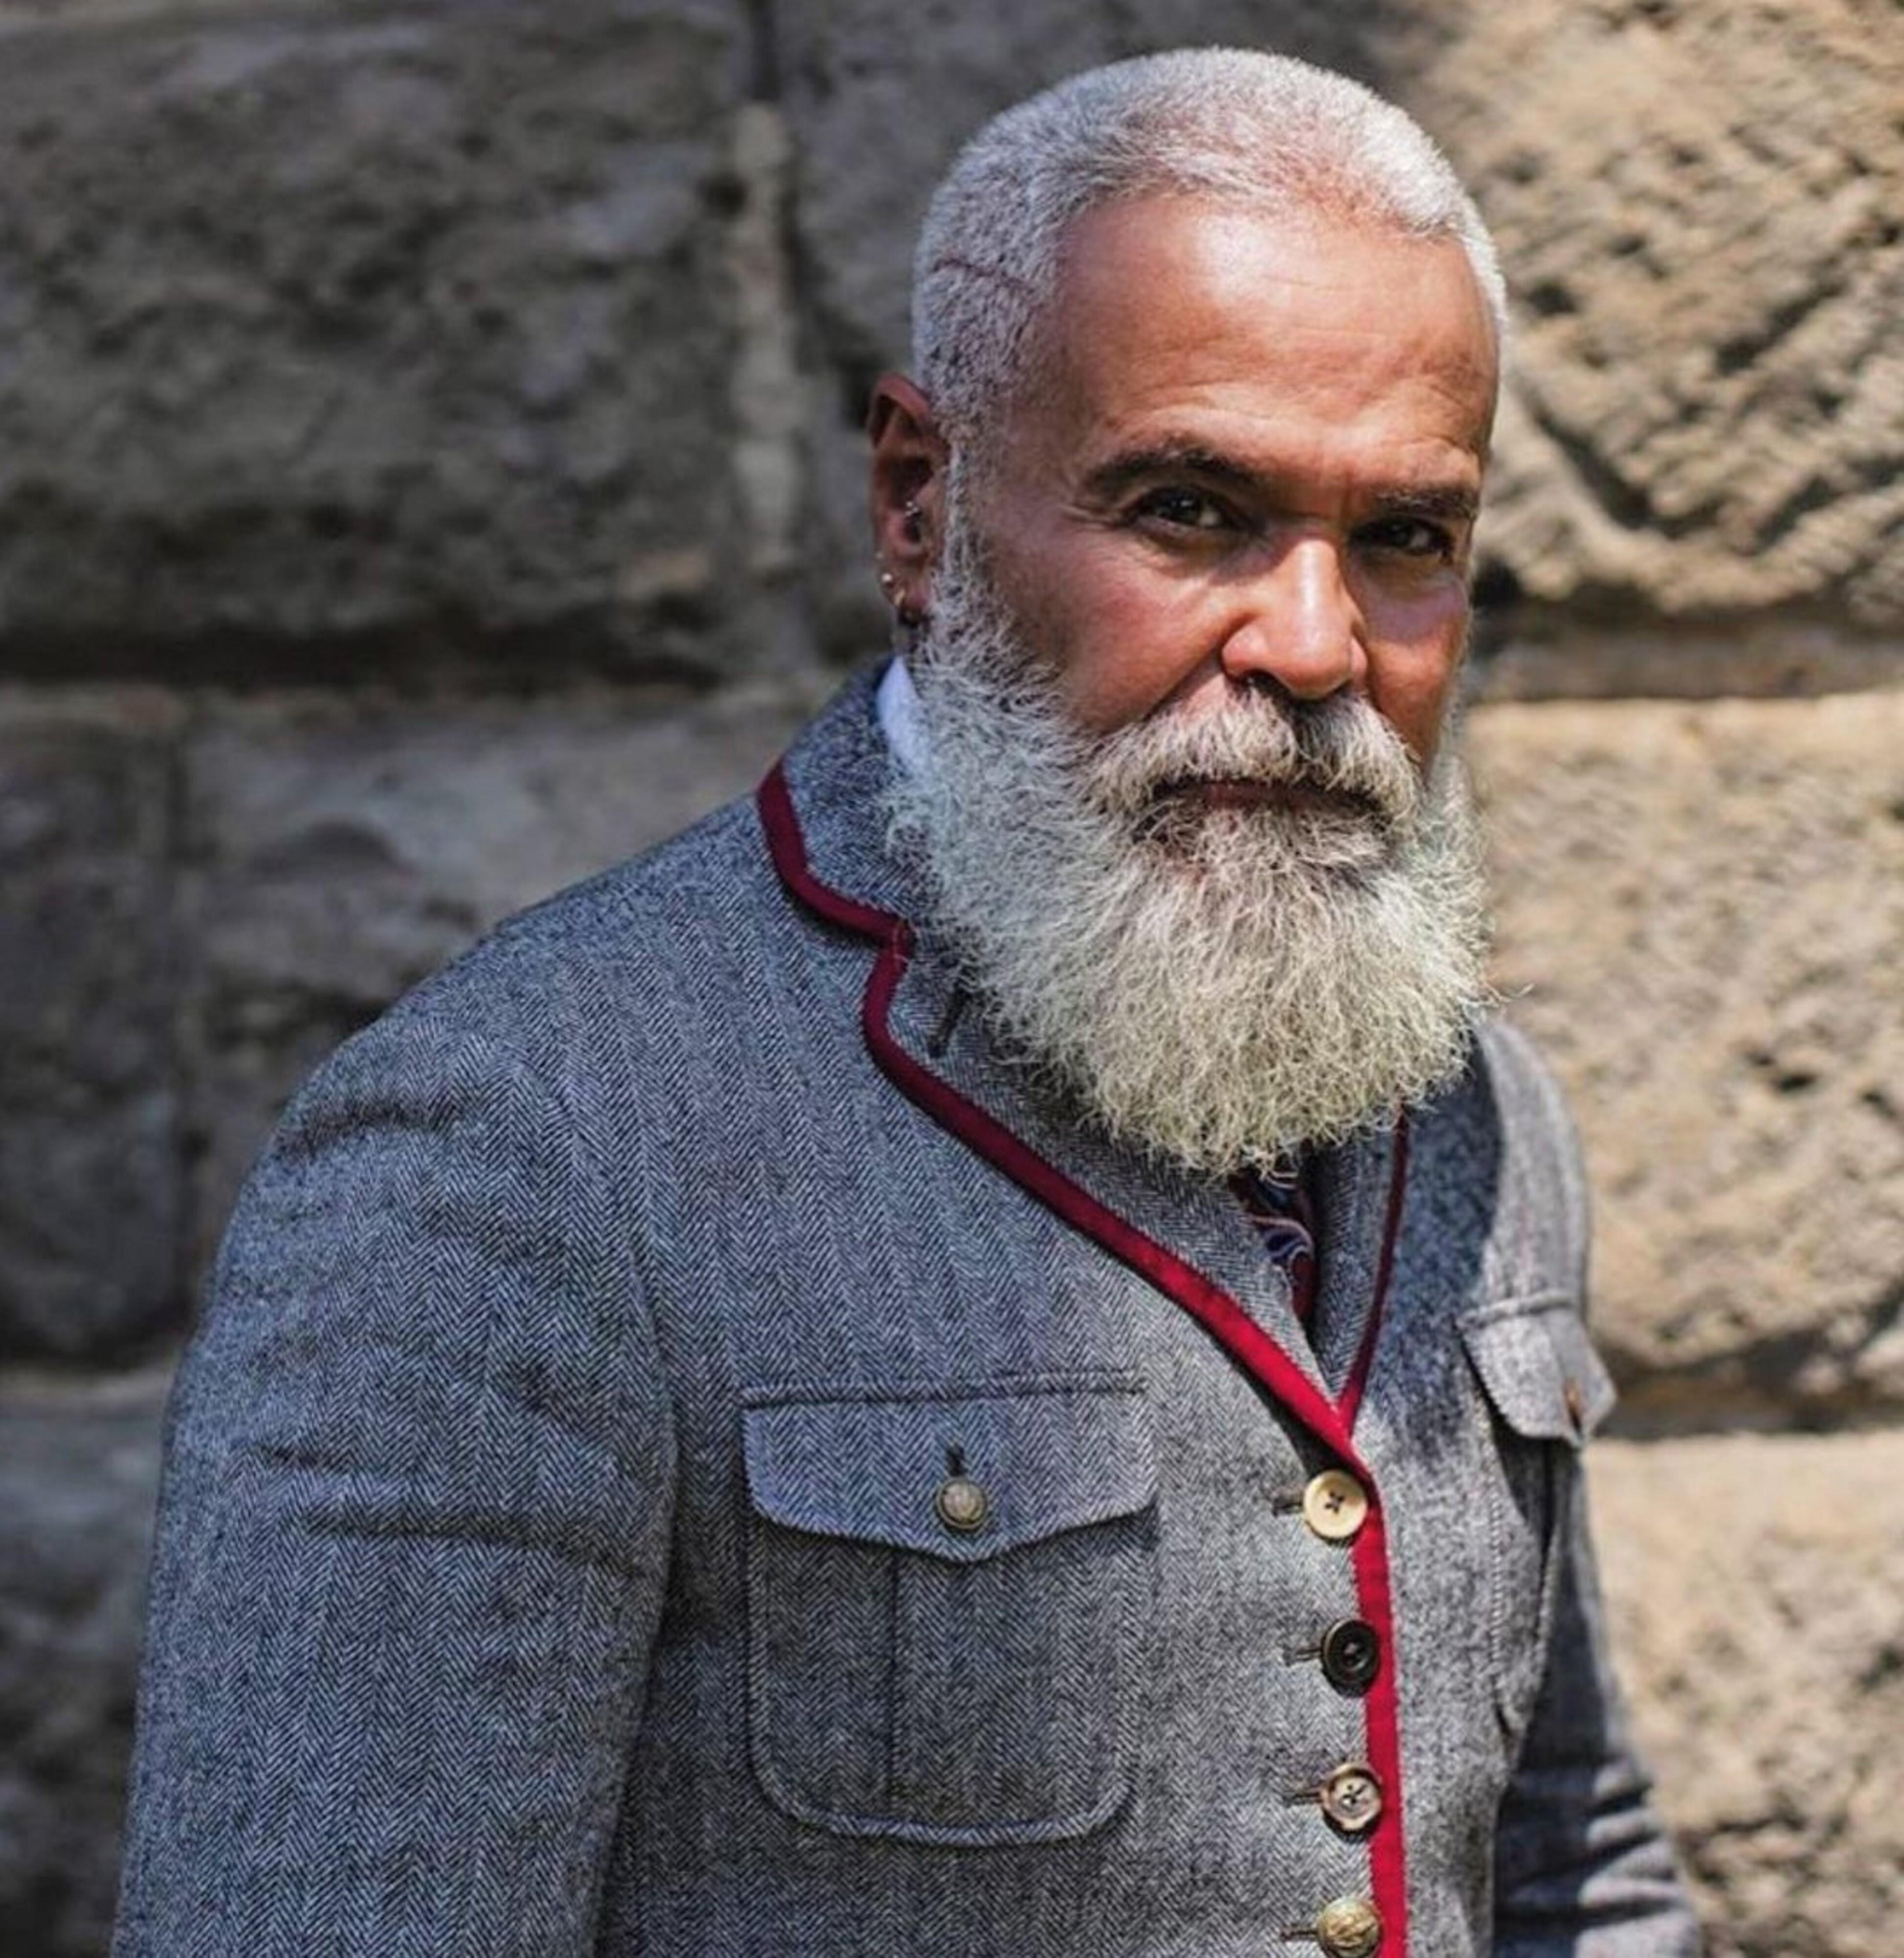 A long beard style for elderly men.